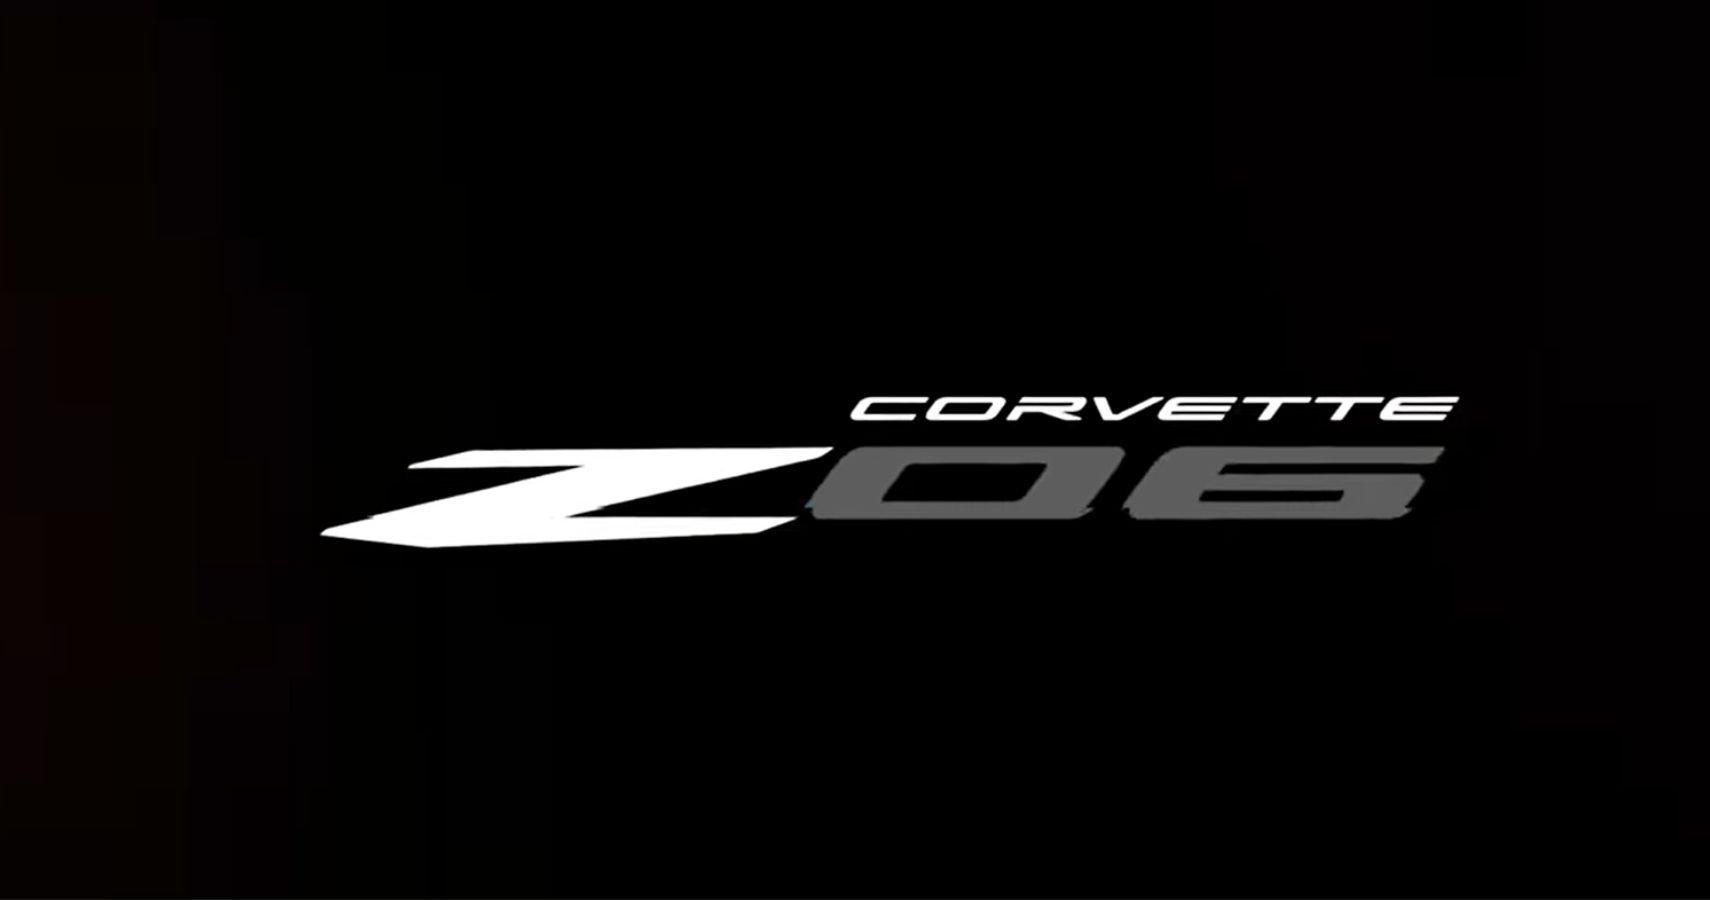 Watch The Teaser Trailer: 2023 Chevrolet Corvette Z06 Officially Announced